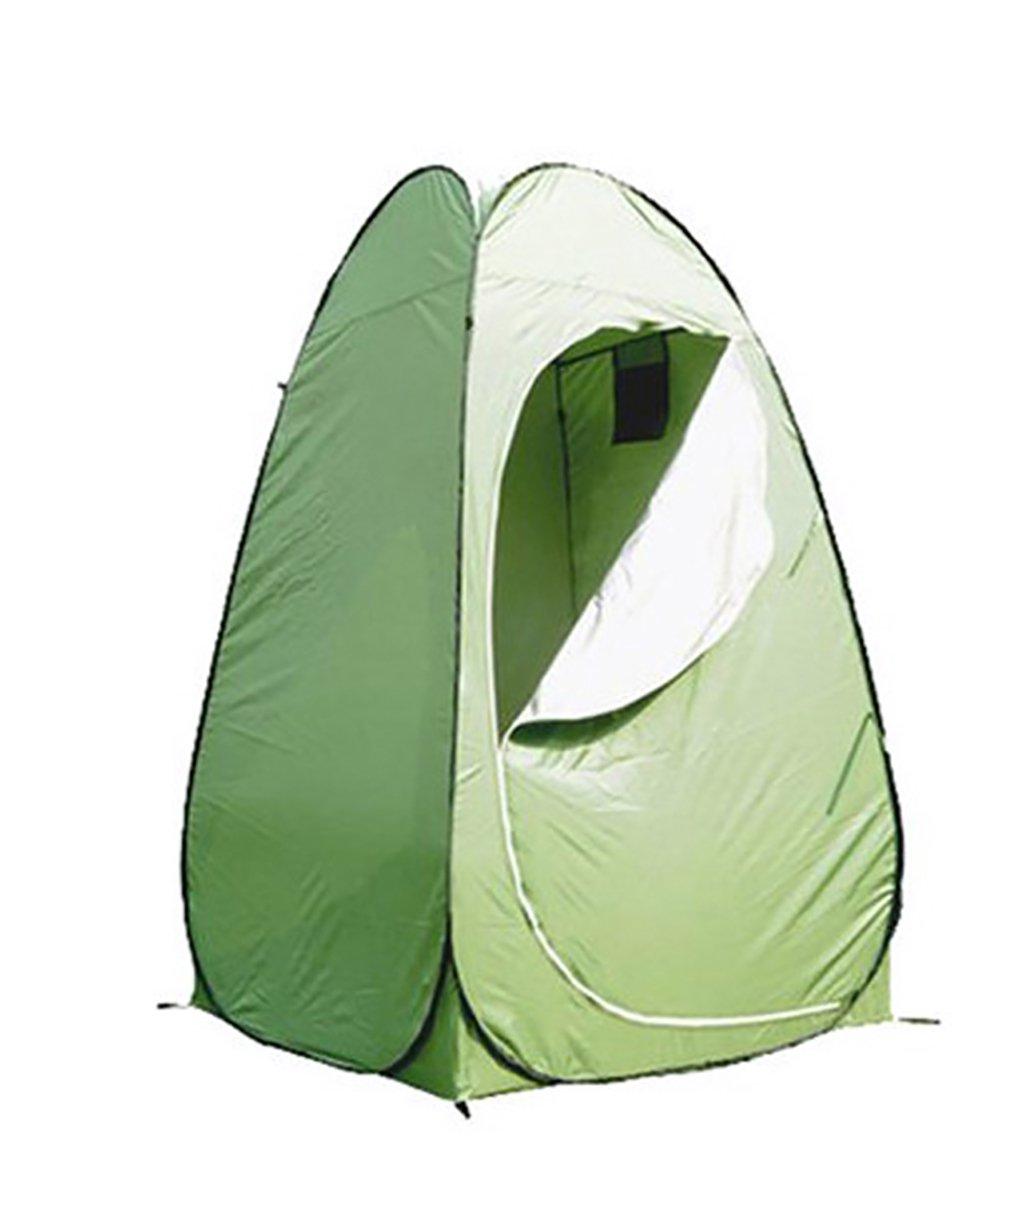 HAIPENG Outdoor-Umbau Kleidung Zelt Wild Camping Bad Warm Bad Konto Regenschutz Zelte (Farbe   2 , größe   120  120  195cm)